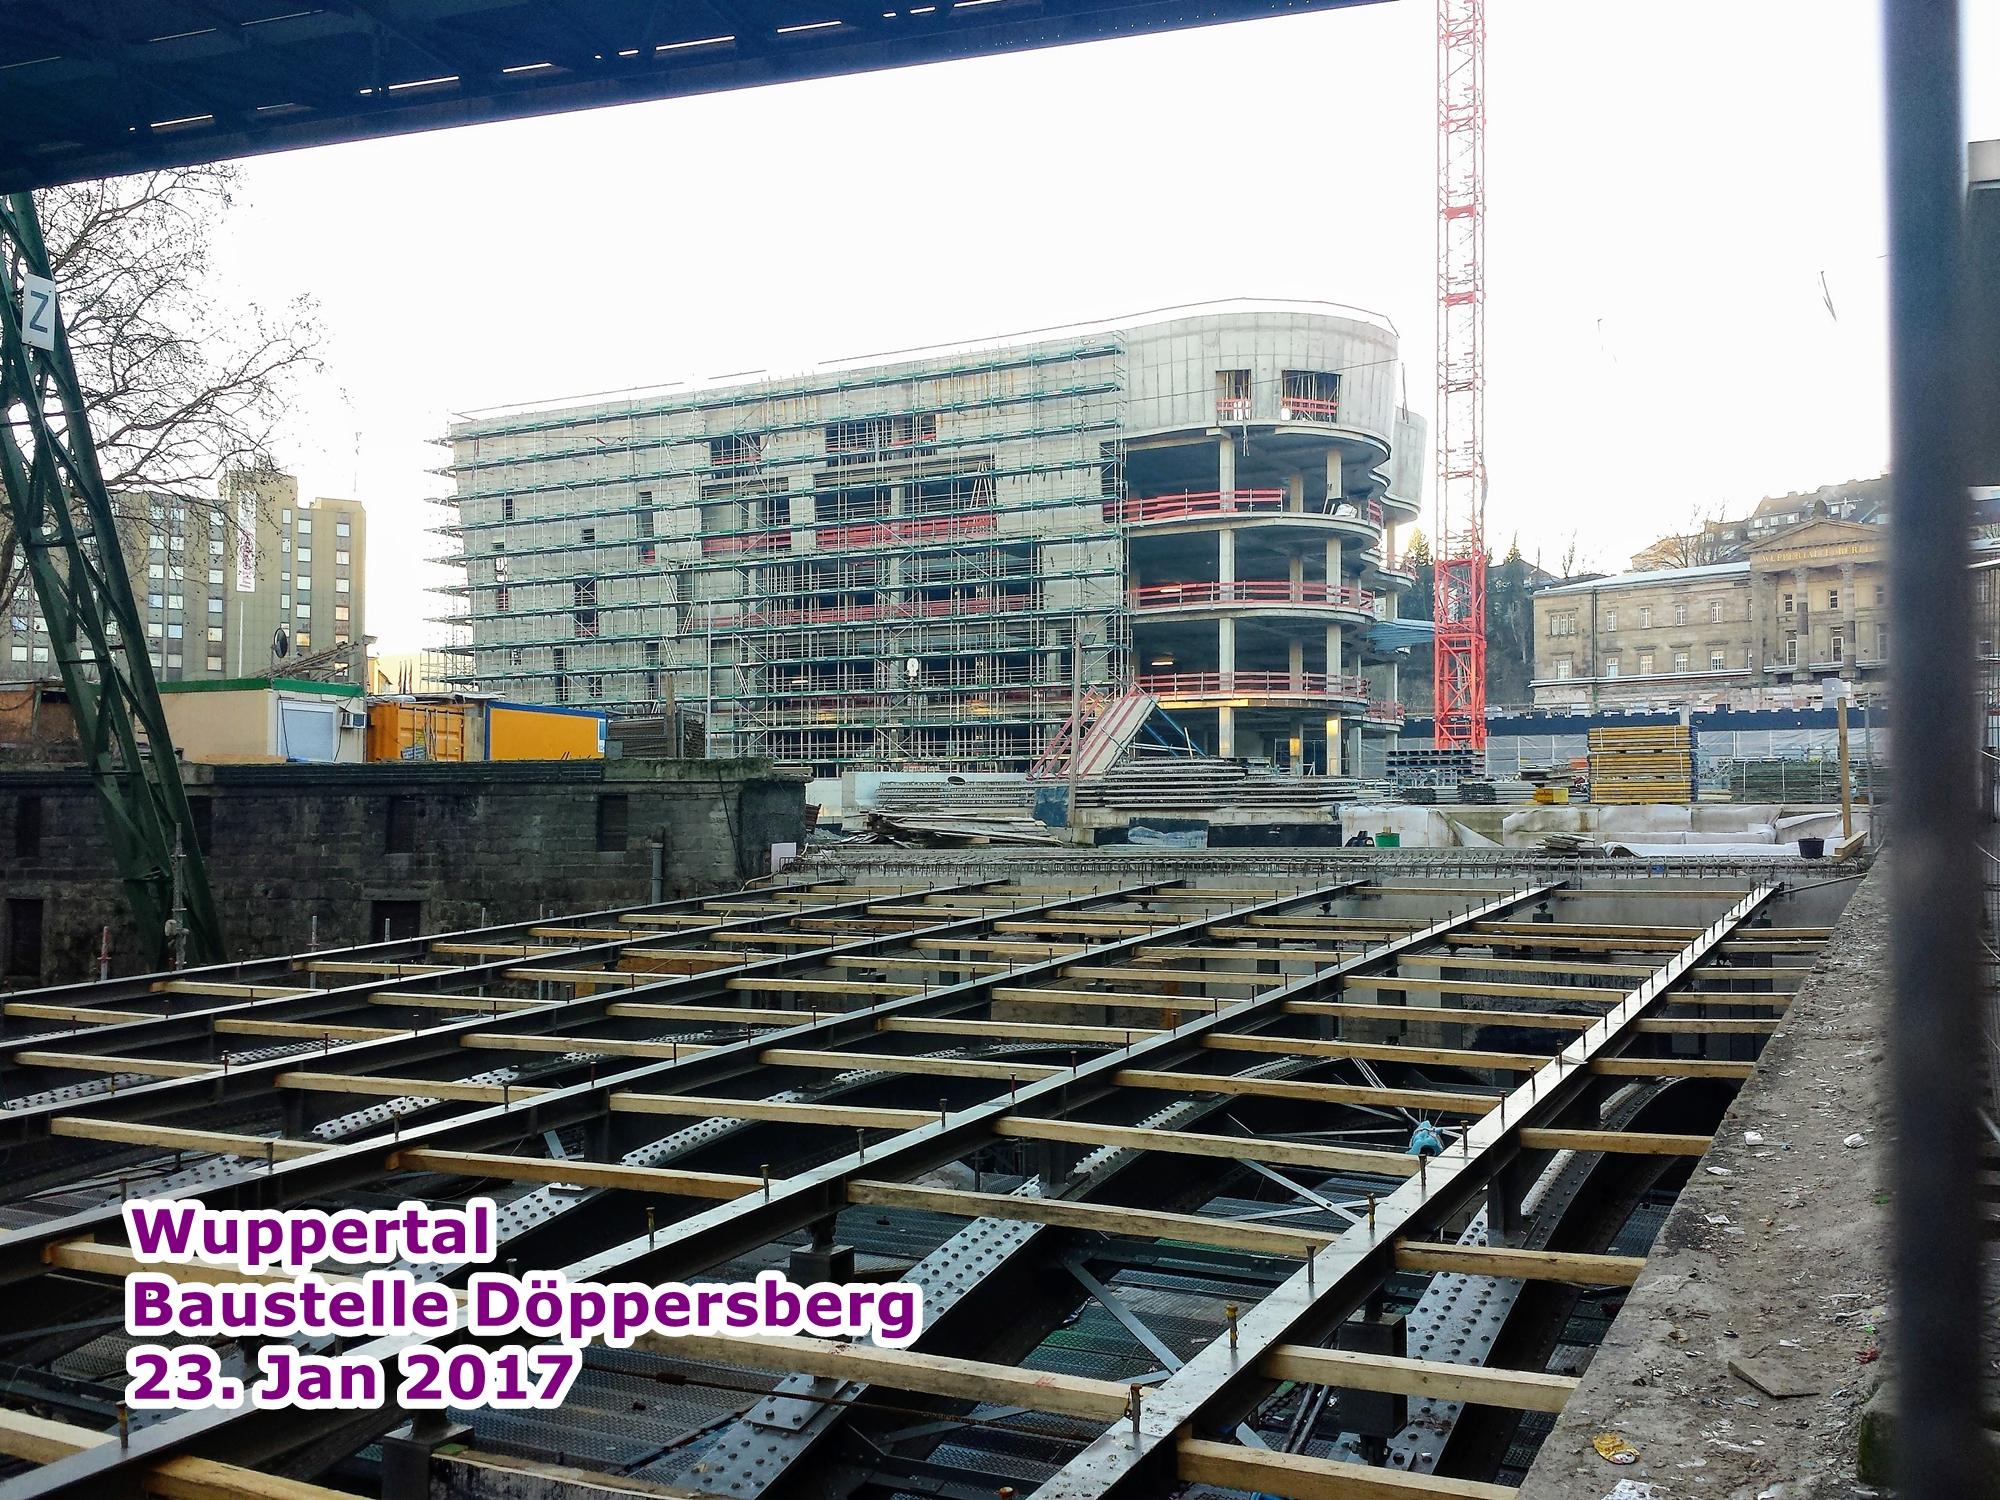 Wuppertal Baustelle B7 (Döppersberg) Januar 2017